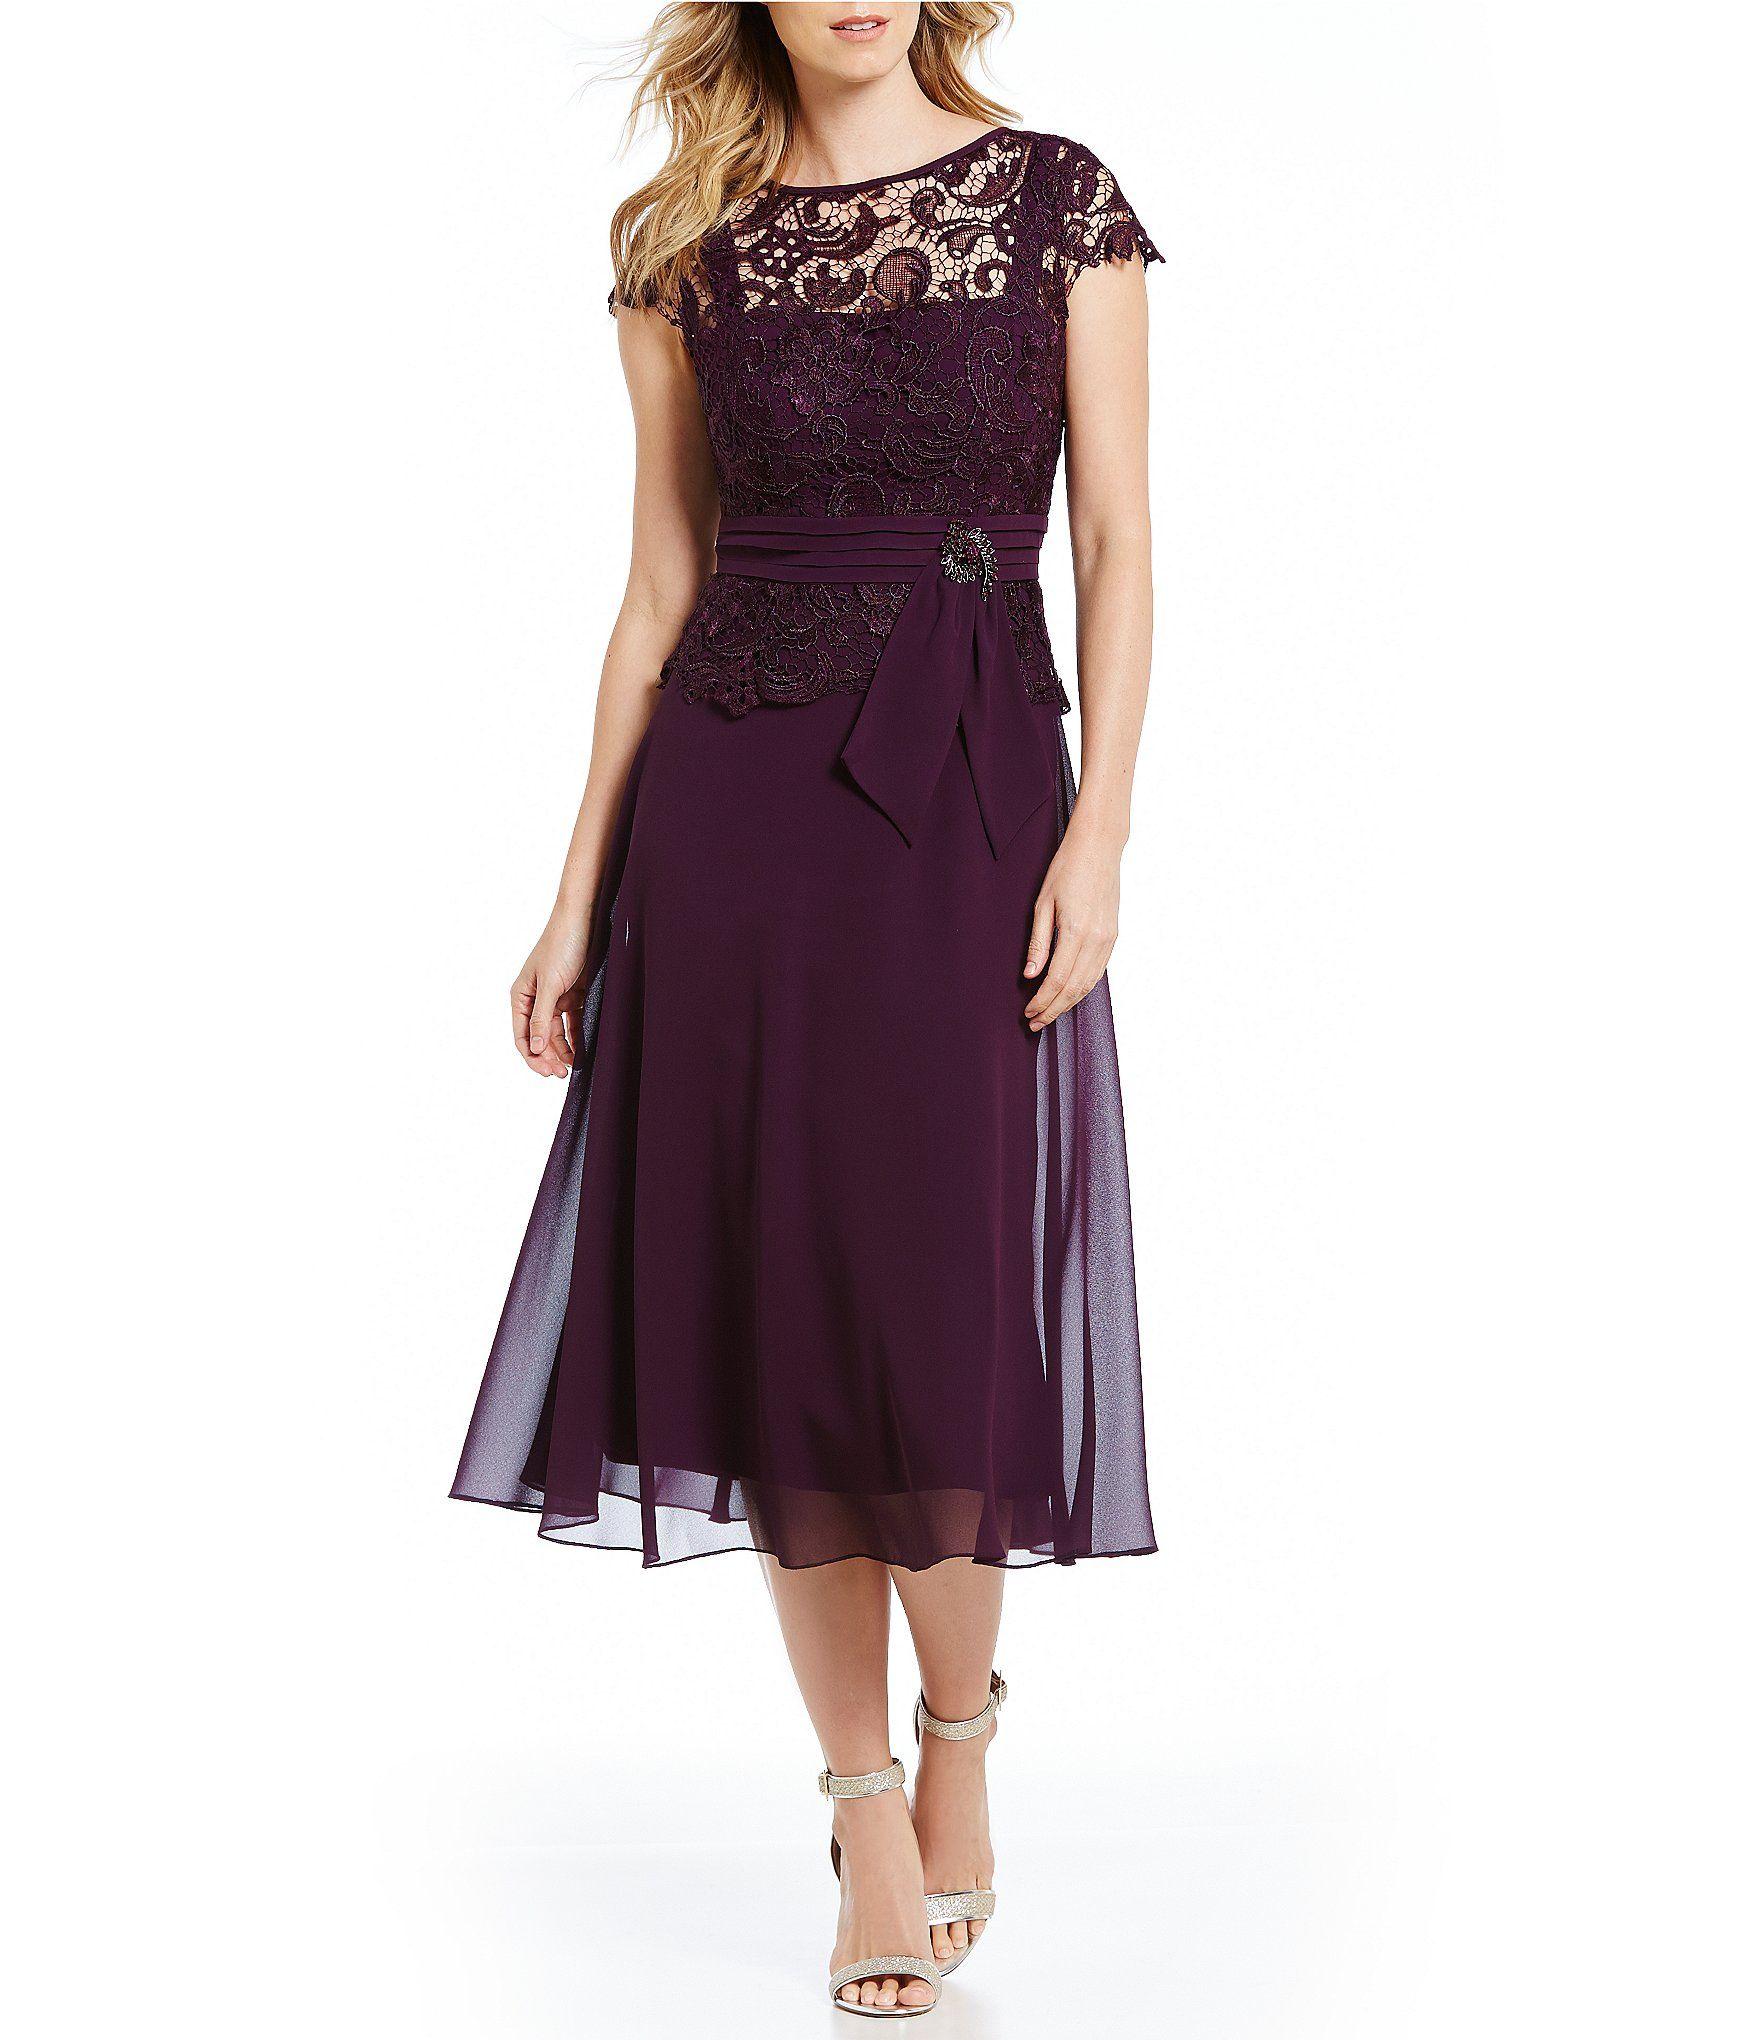 Emma Street Illusion Lace Mock 2-Piece Dress   The bride ...